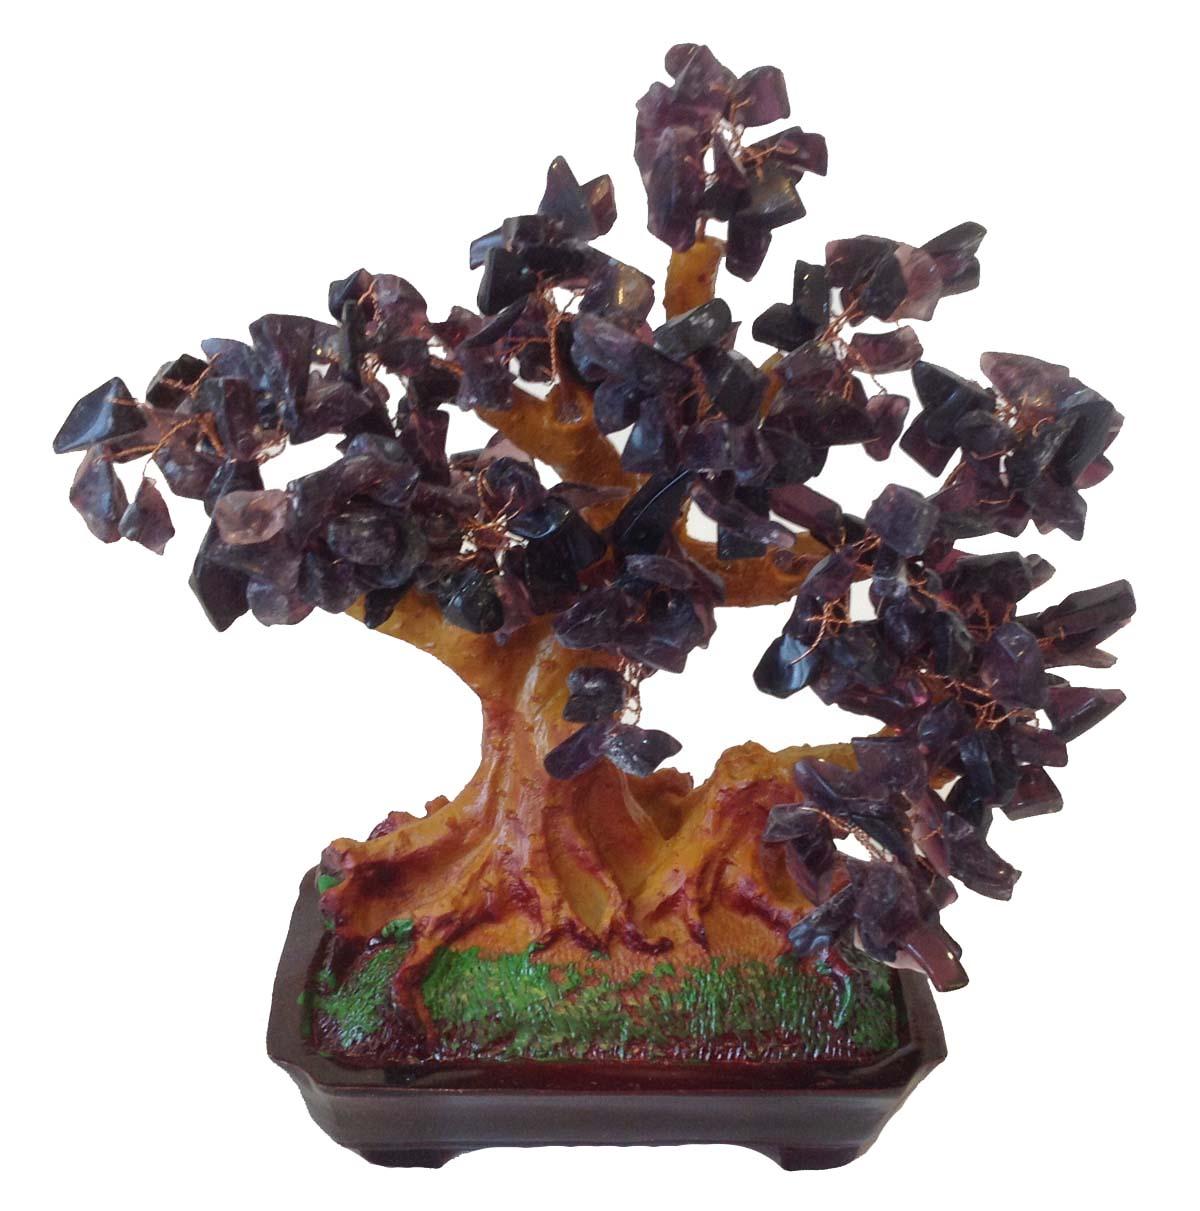 feng shui gl cksbaum 25 cm geldbaum bonsai pfennigbaum. Black Bedroom Furniture Sets. Home Design Ideas